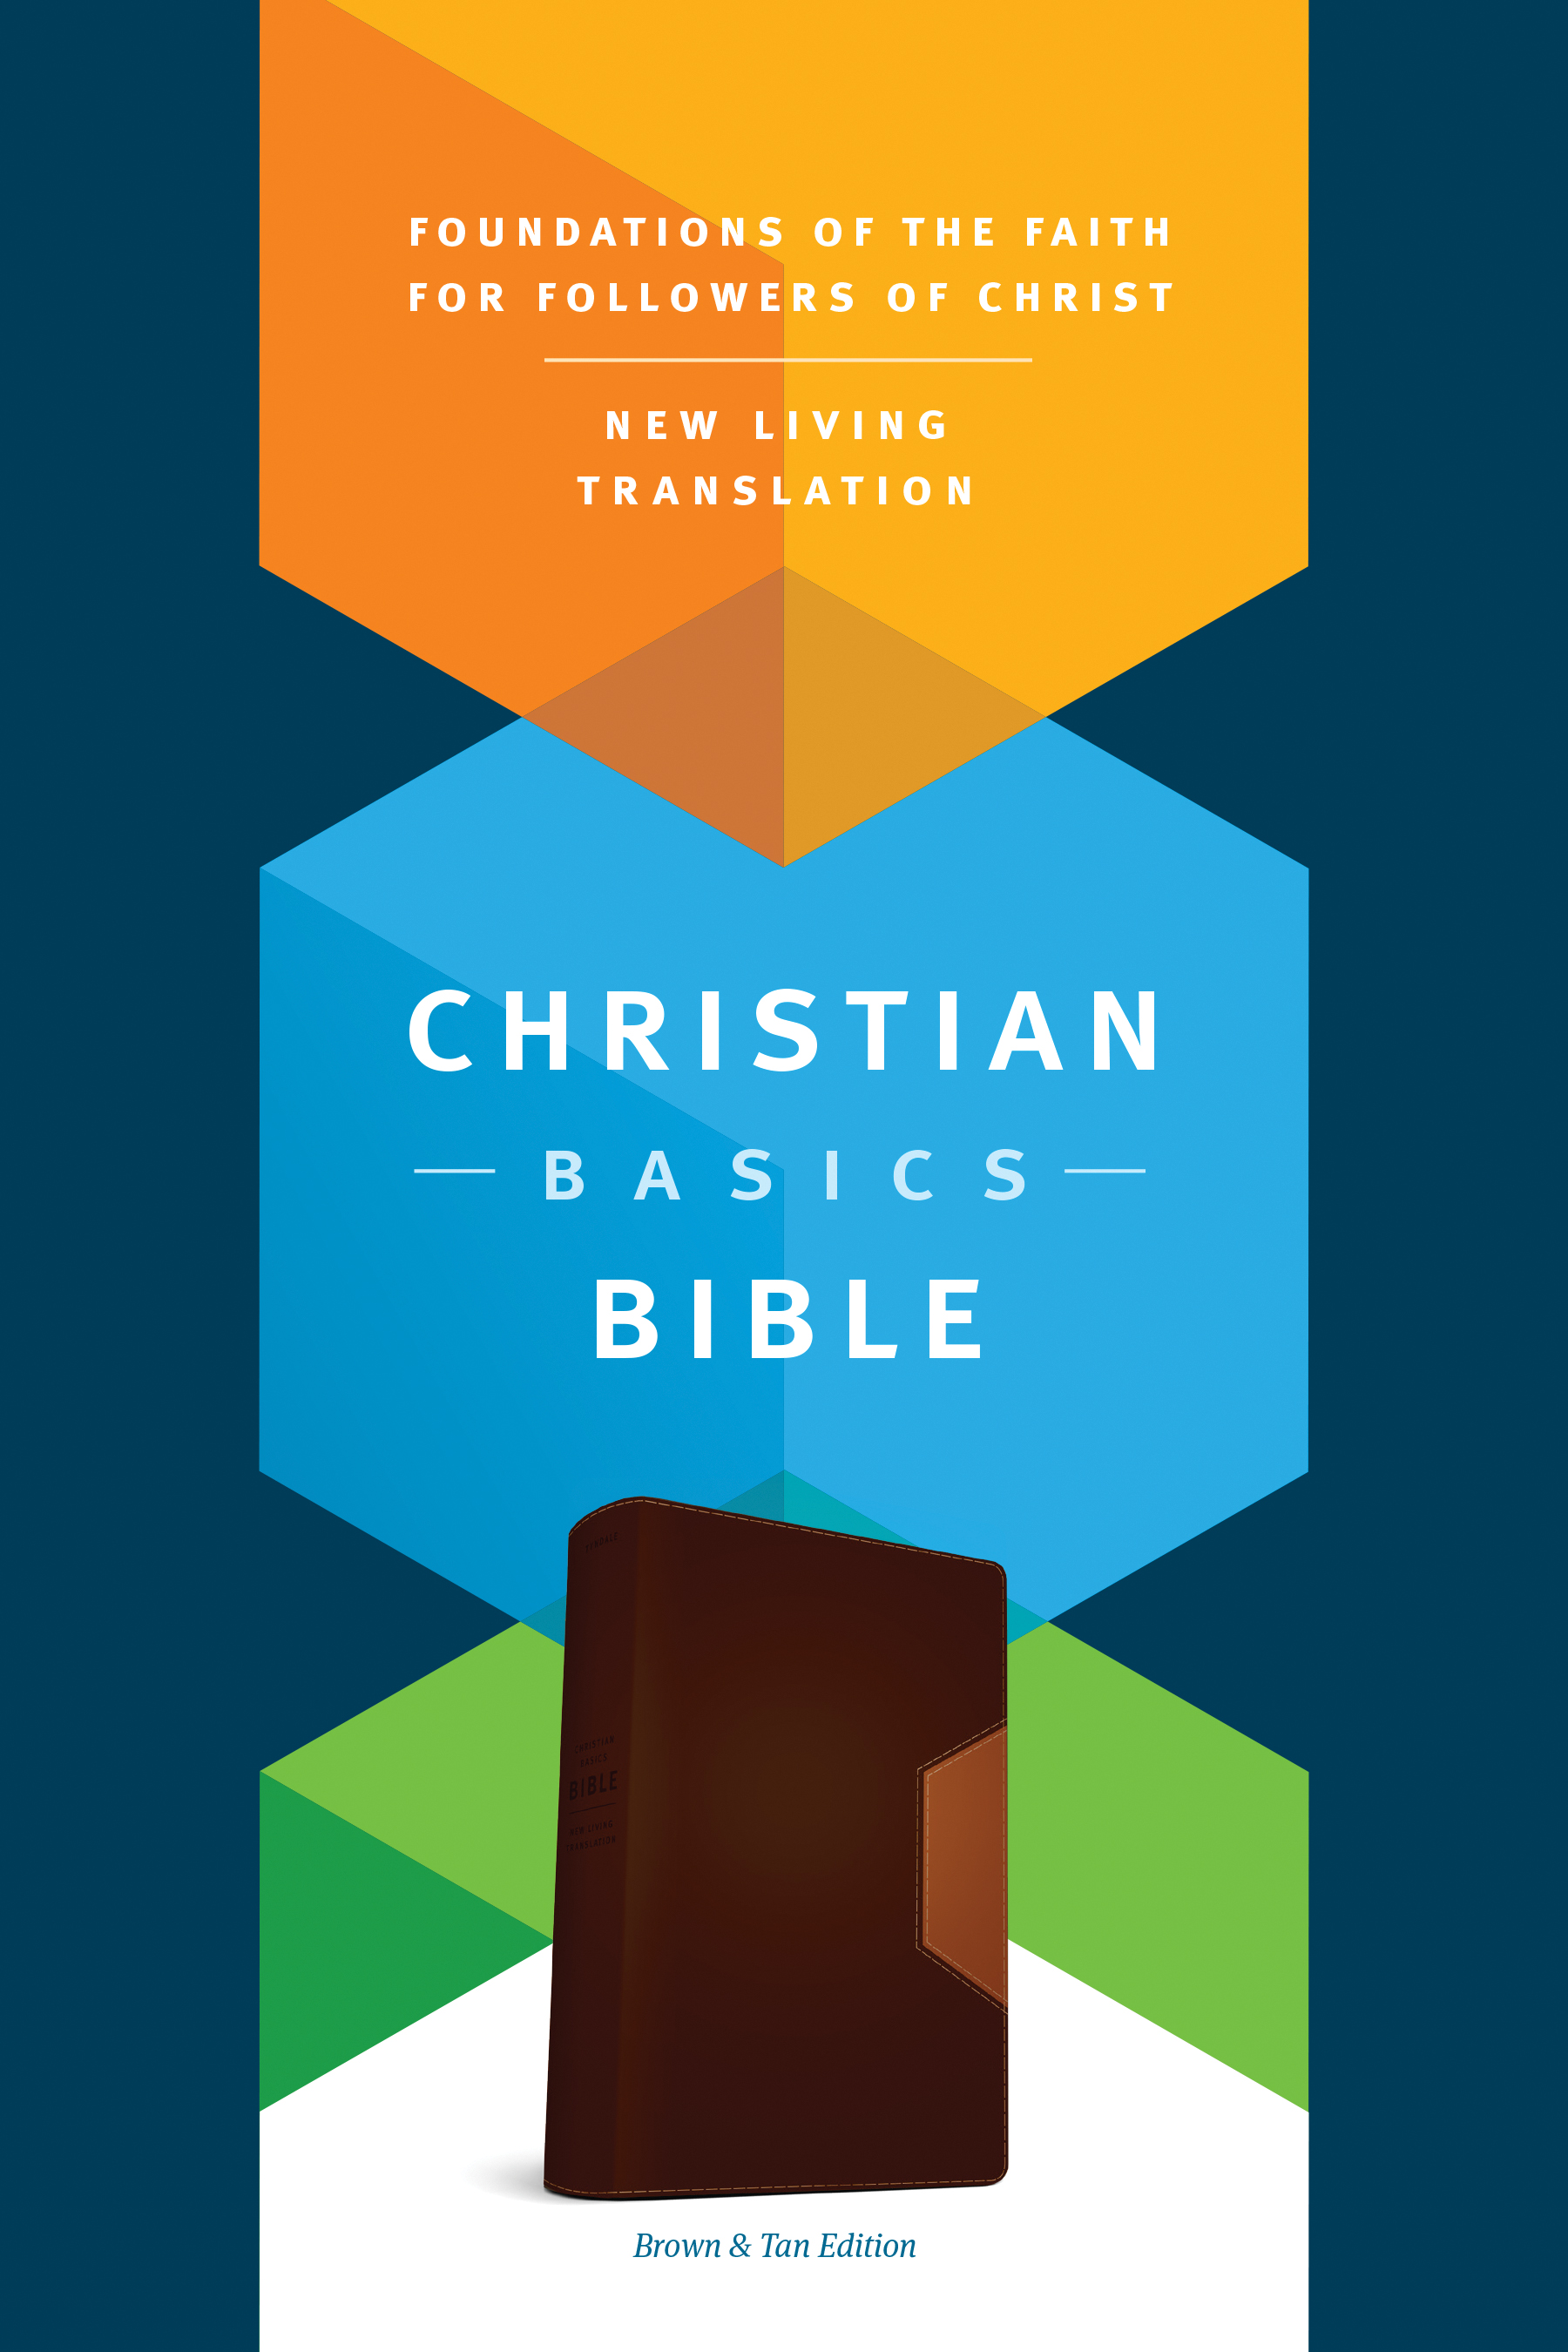 Christian Basics Bible NLT, TuTone (LeatherLike, Brown/Tan)